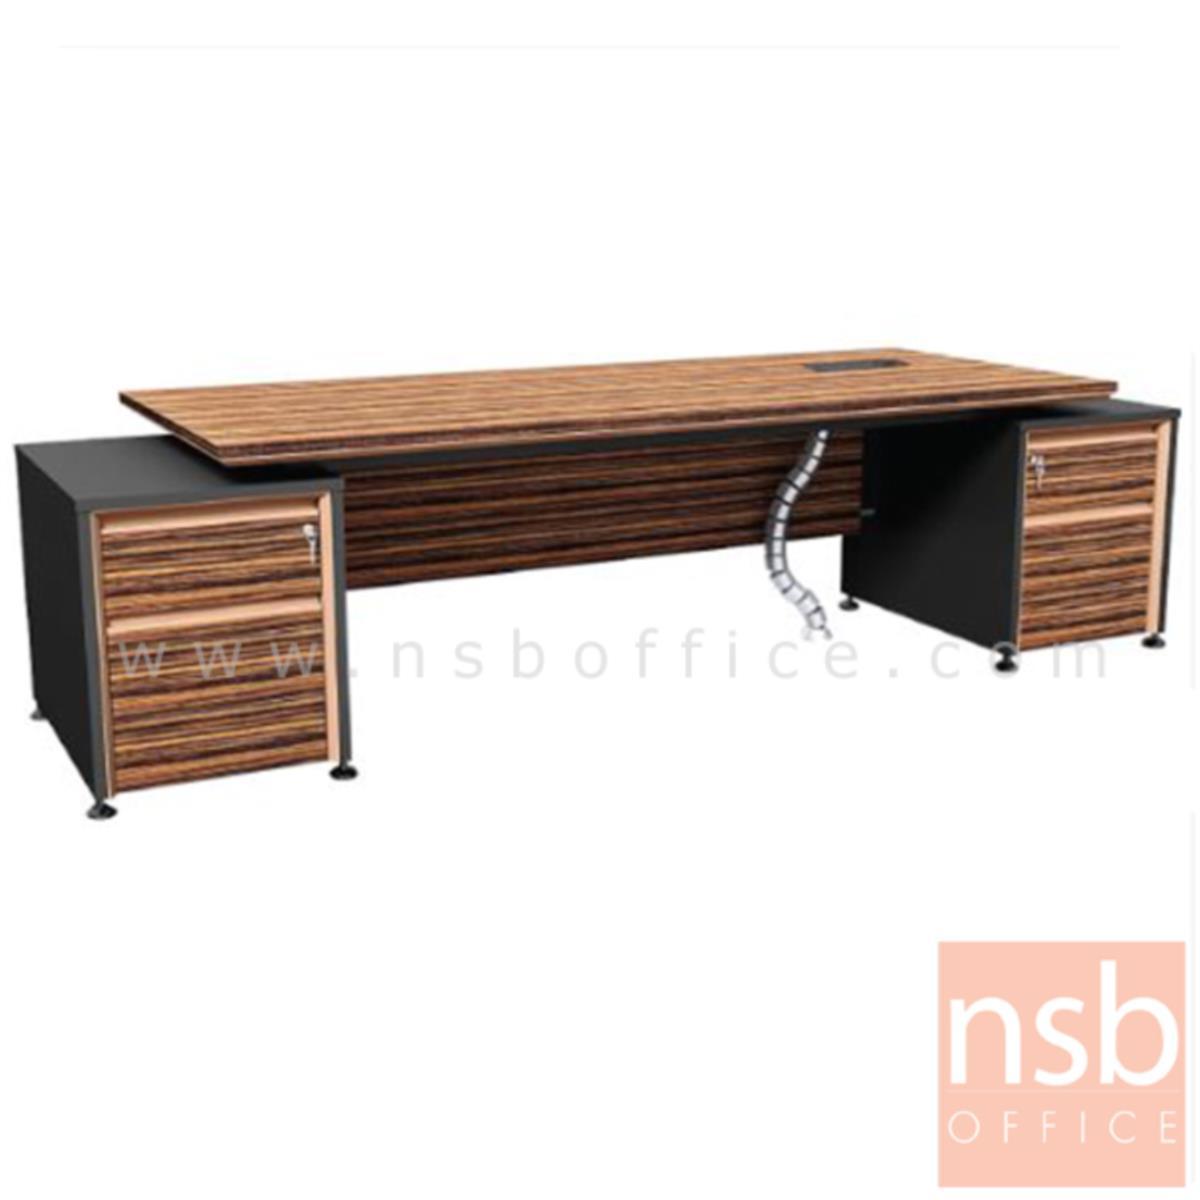 A26A001:โต๊ะผู้บริหาร 2 ลิ้นชักซ้ายขวา  รุ่น Bulgari Black ขนาด 289.5W cm.  สีลายไม้ซีบราโน่ตัดดำ ขอบ ROSEGOLD